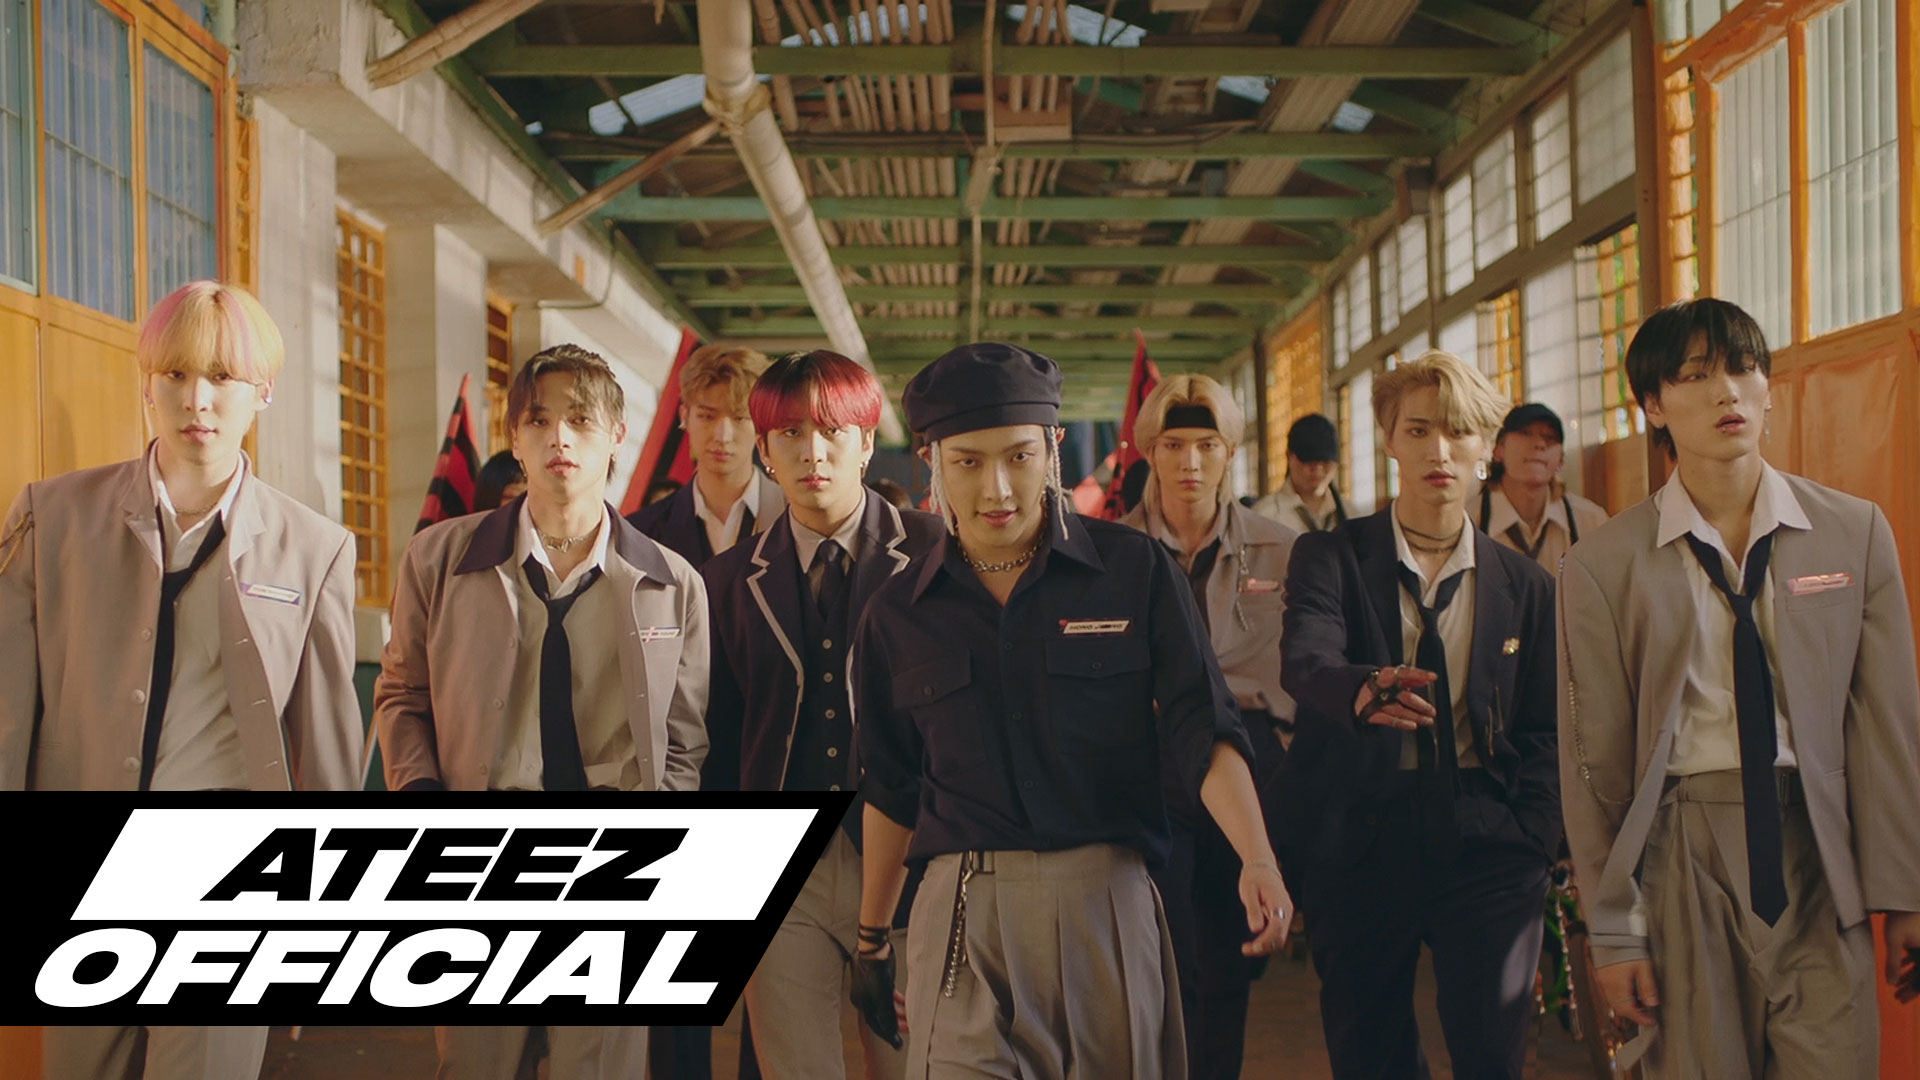 ATEEZ(에이티즈) - 'THANXX' Official MV Teaser